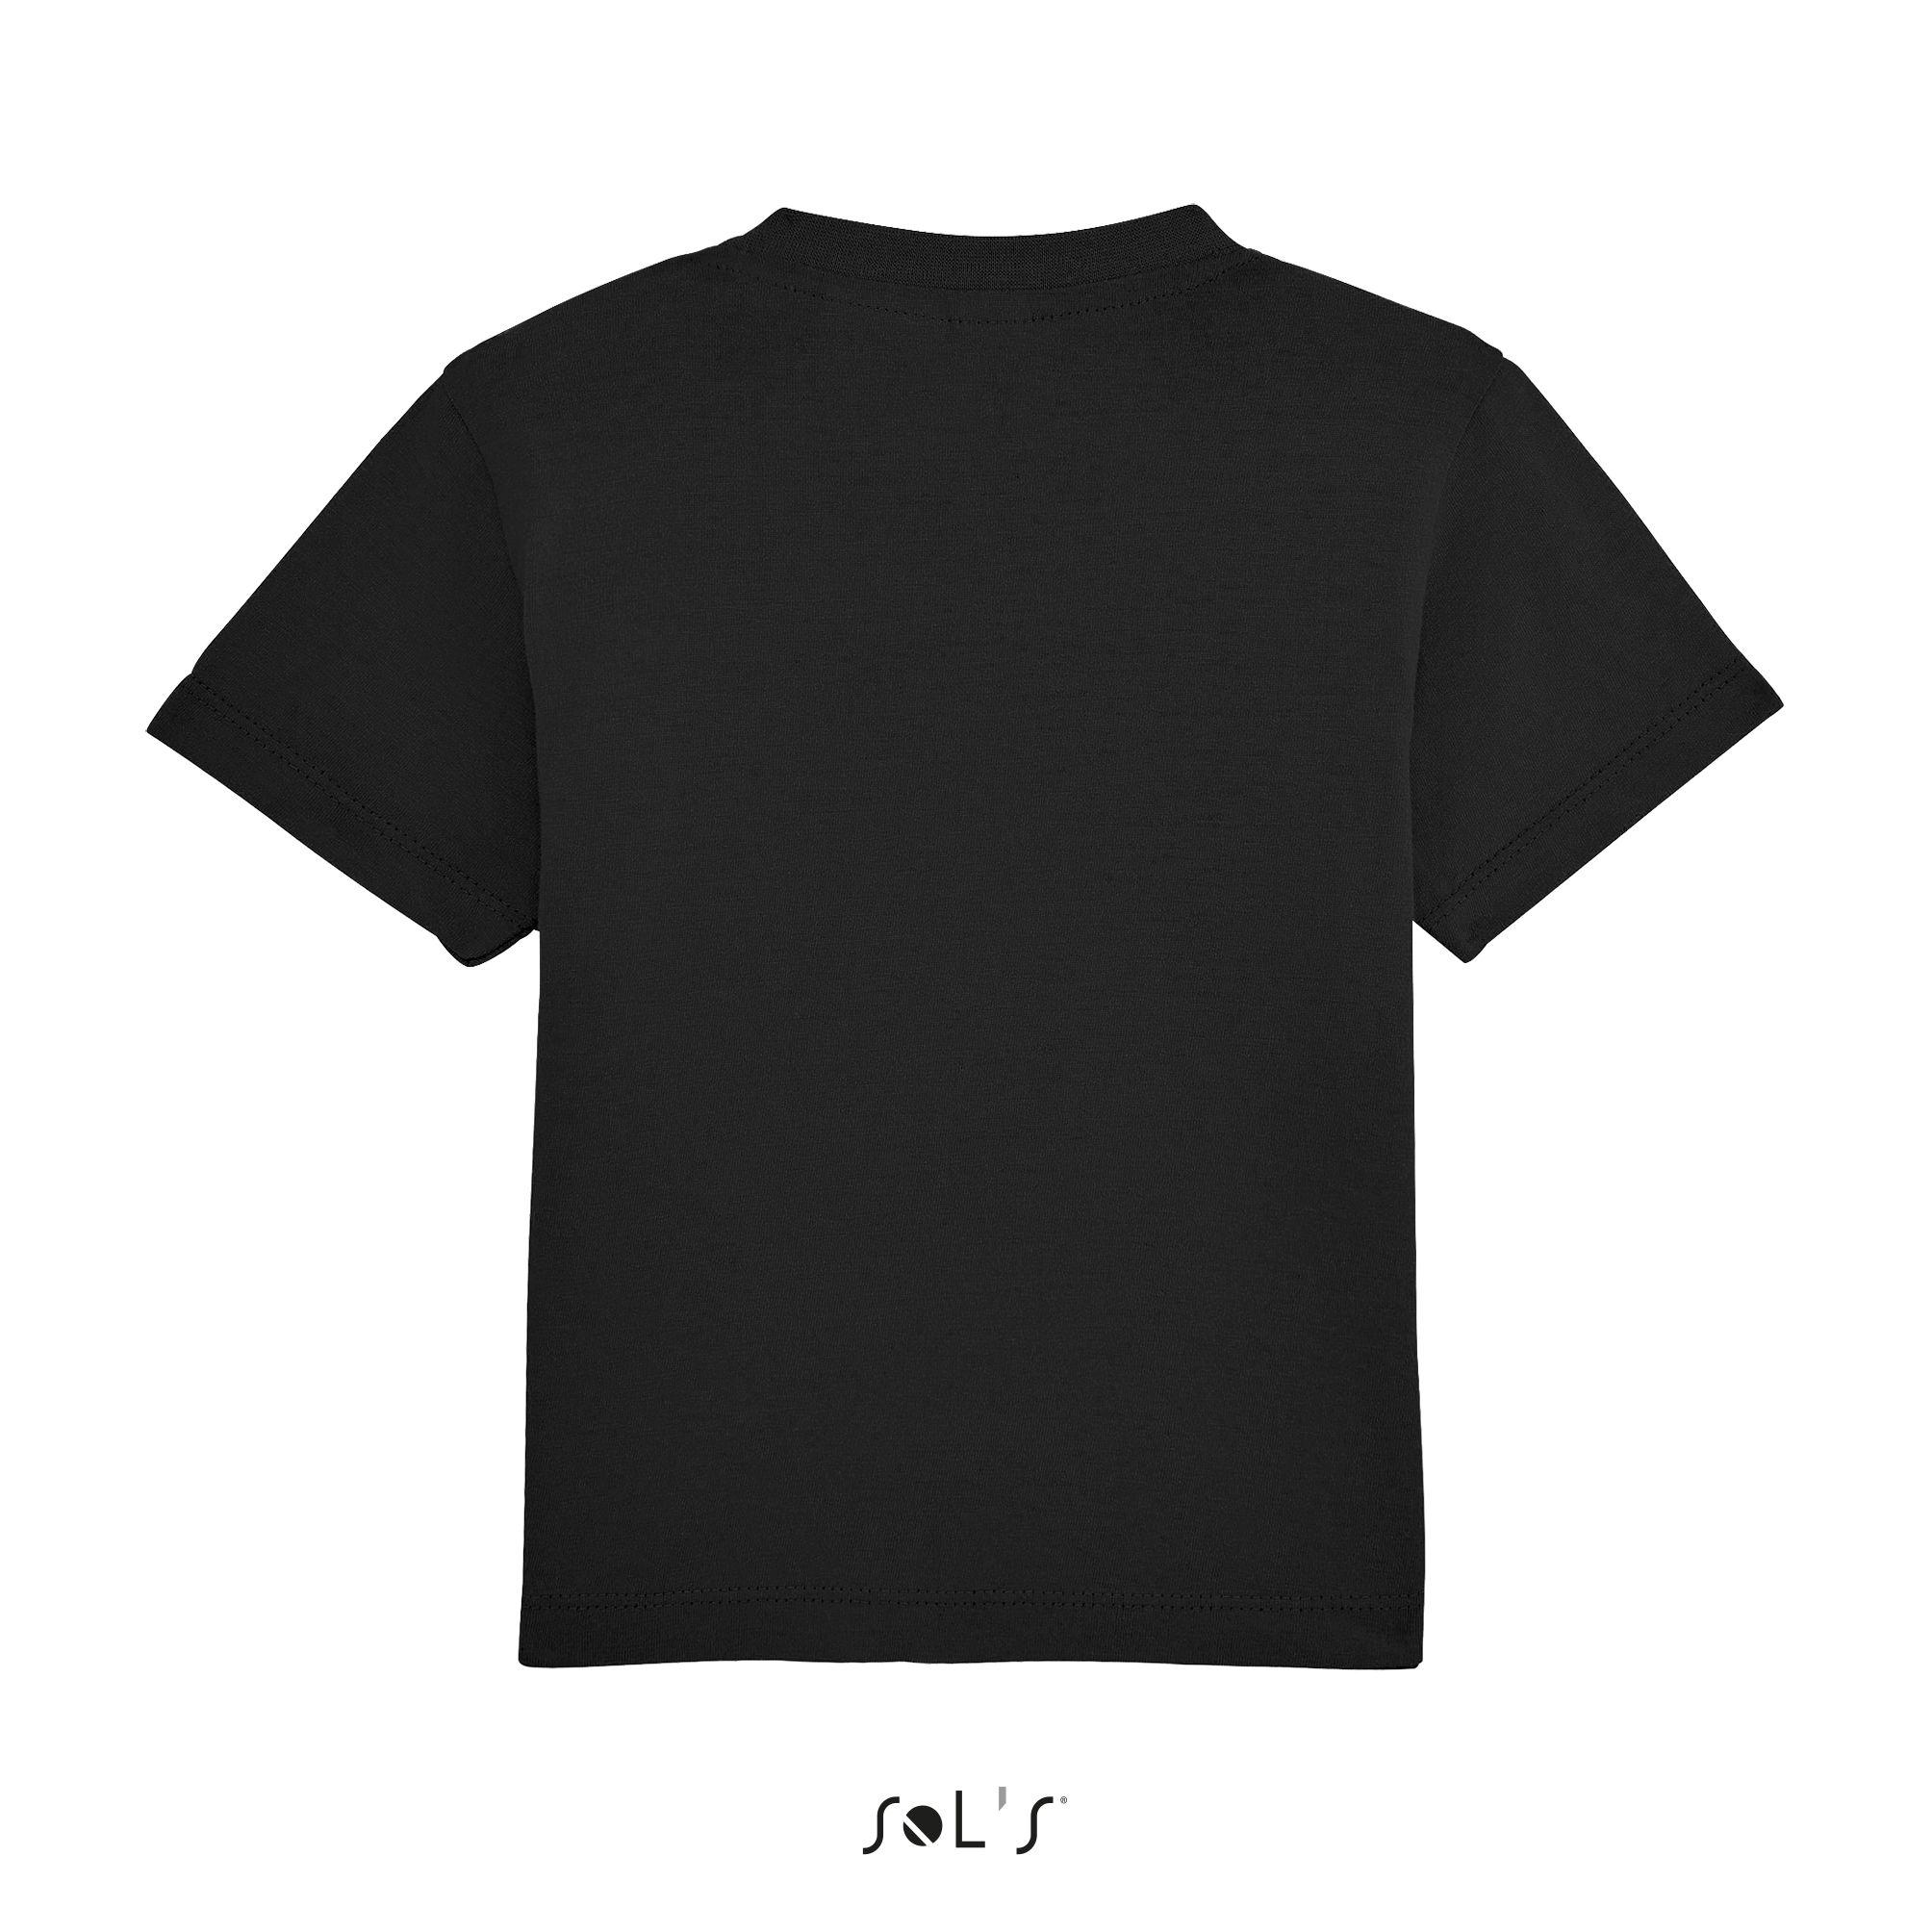 309 - Deep black